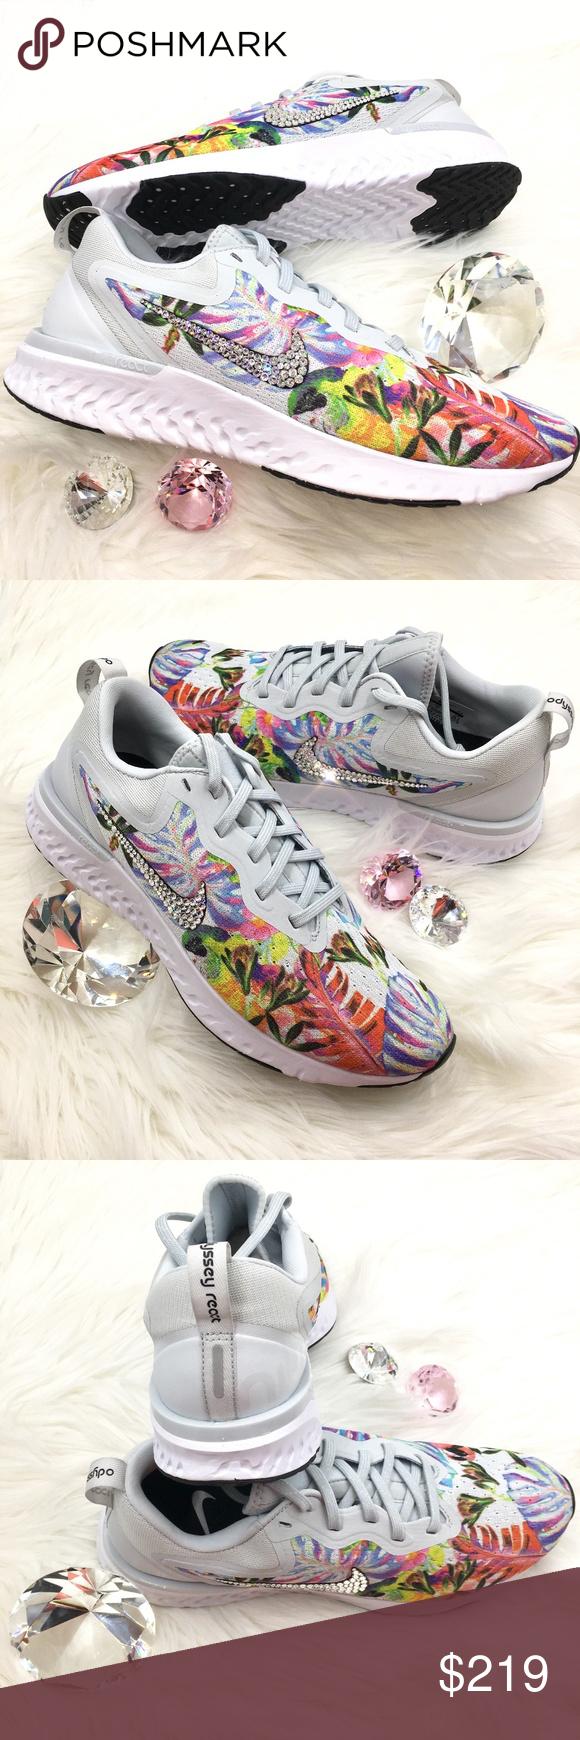 cf8d670d7863 Swarovski Nike Odyssey React Floral Bling Shoes GORGEOUS!! Brand New Nike  Odyssey React Women s